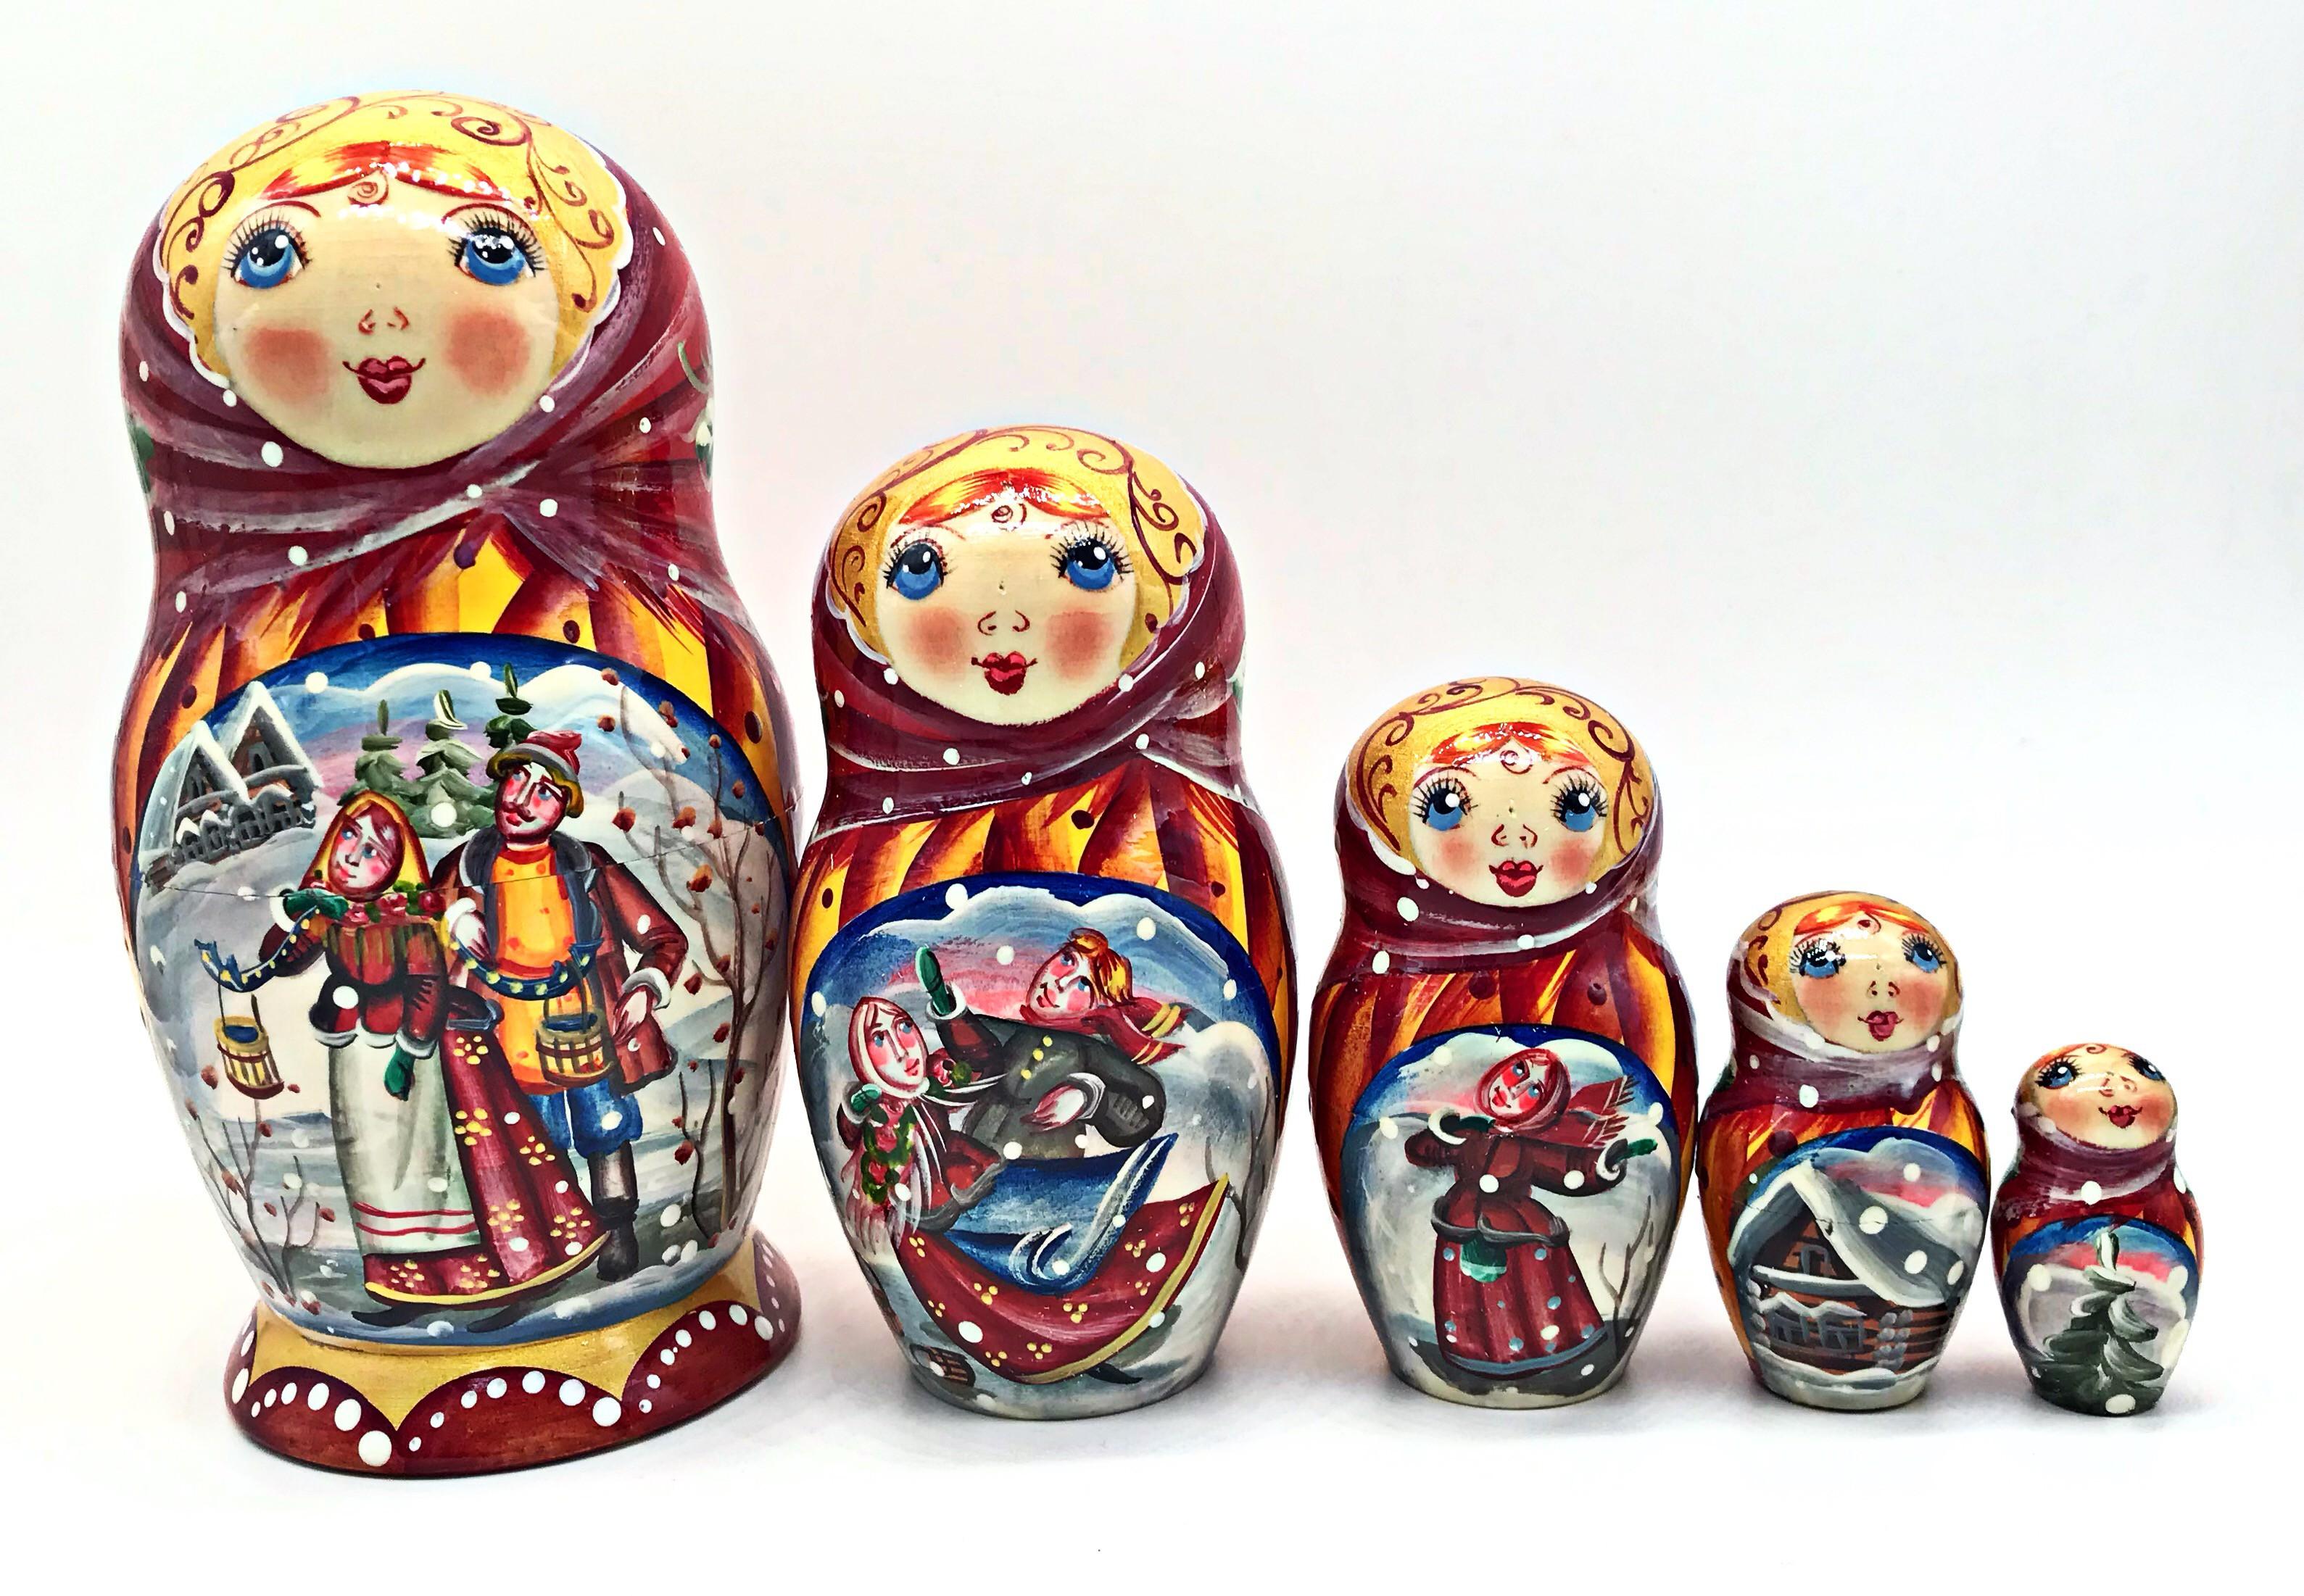 Matrioska Invierno, 5 piezas